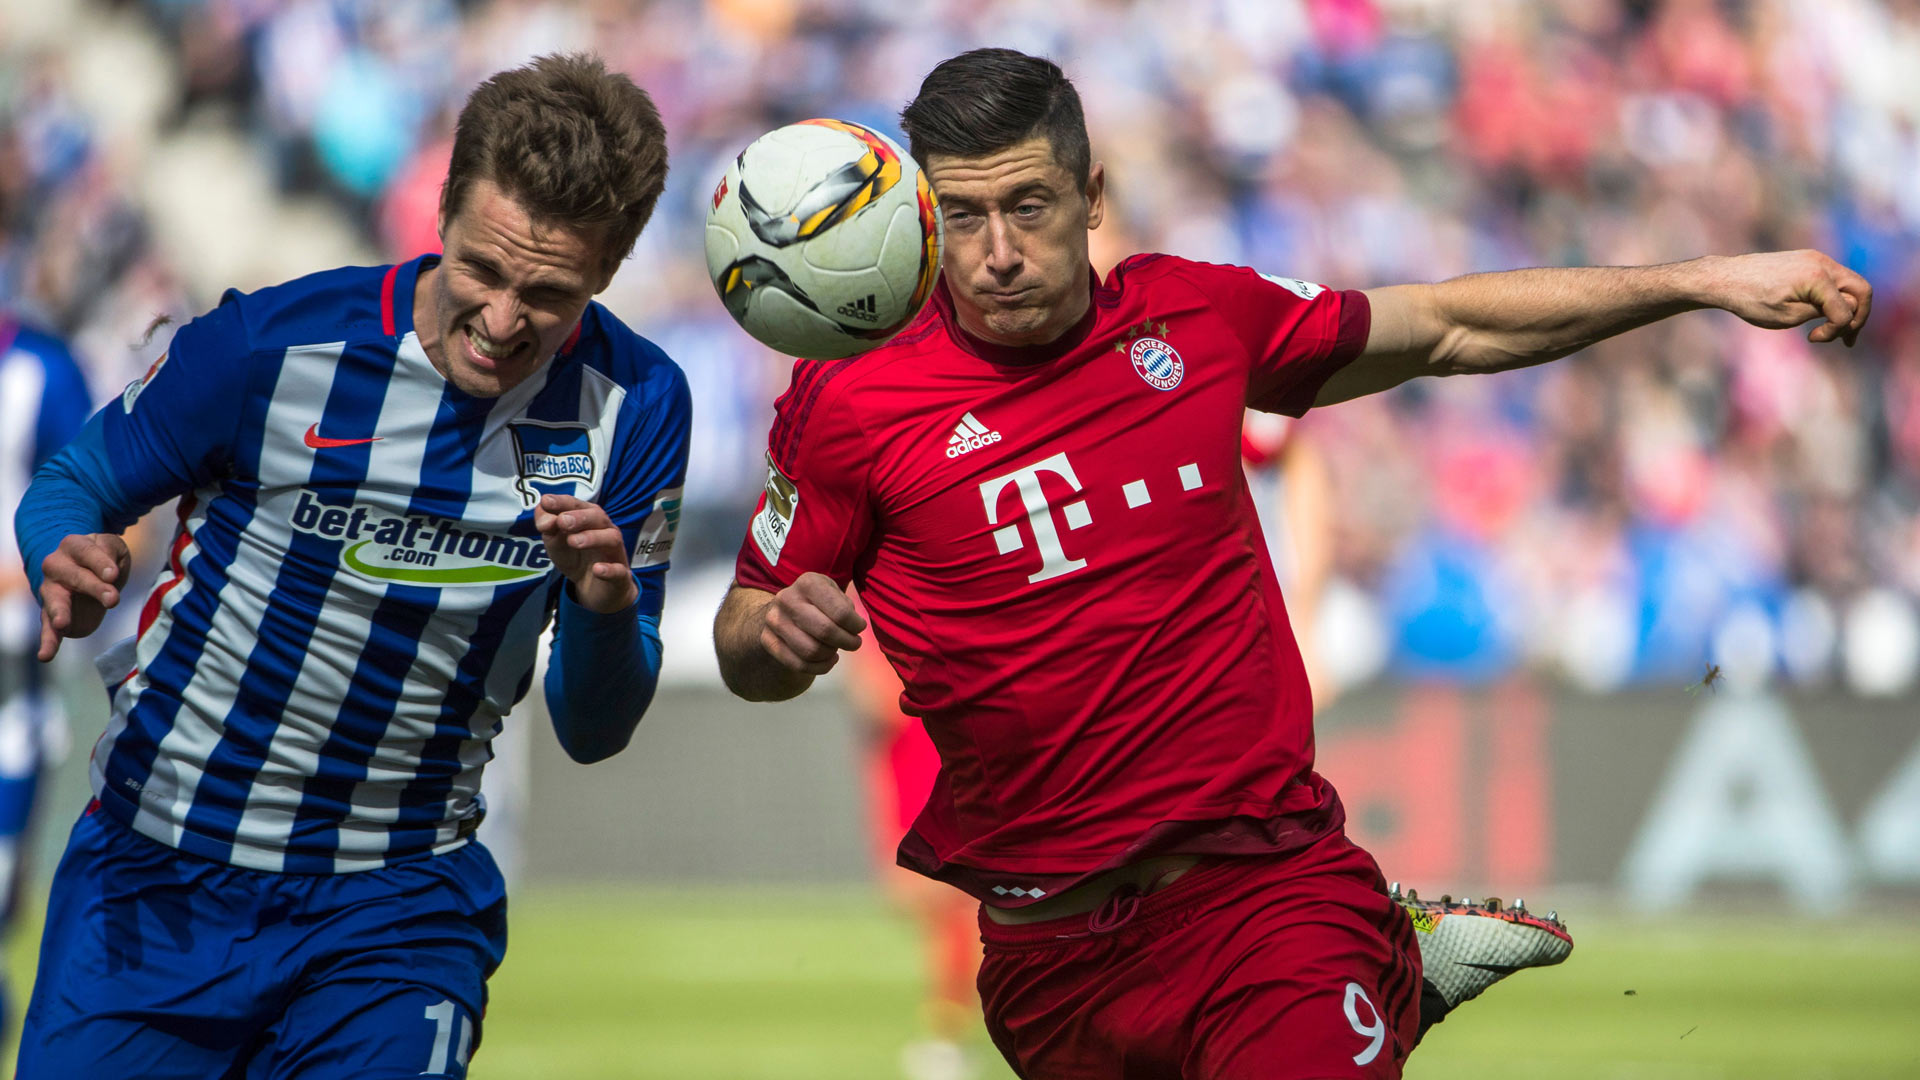 Hertha BSC 0 - 2 Bayern München Match report - 4 23 16 Bundesliga ... 8078b5758